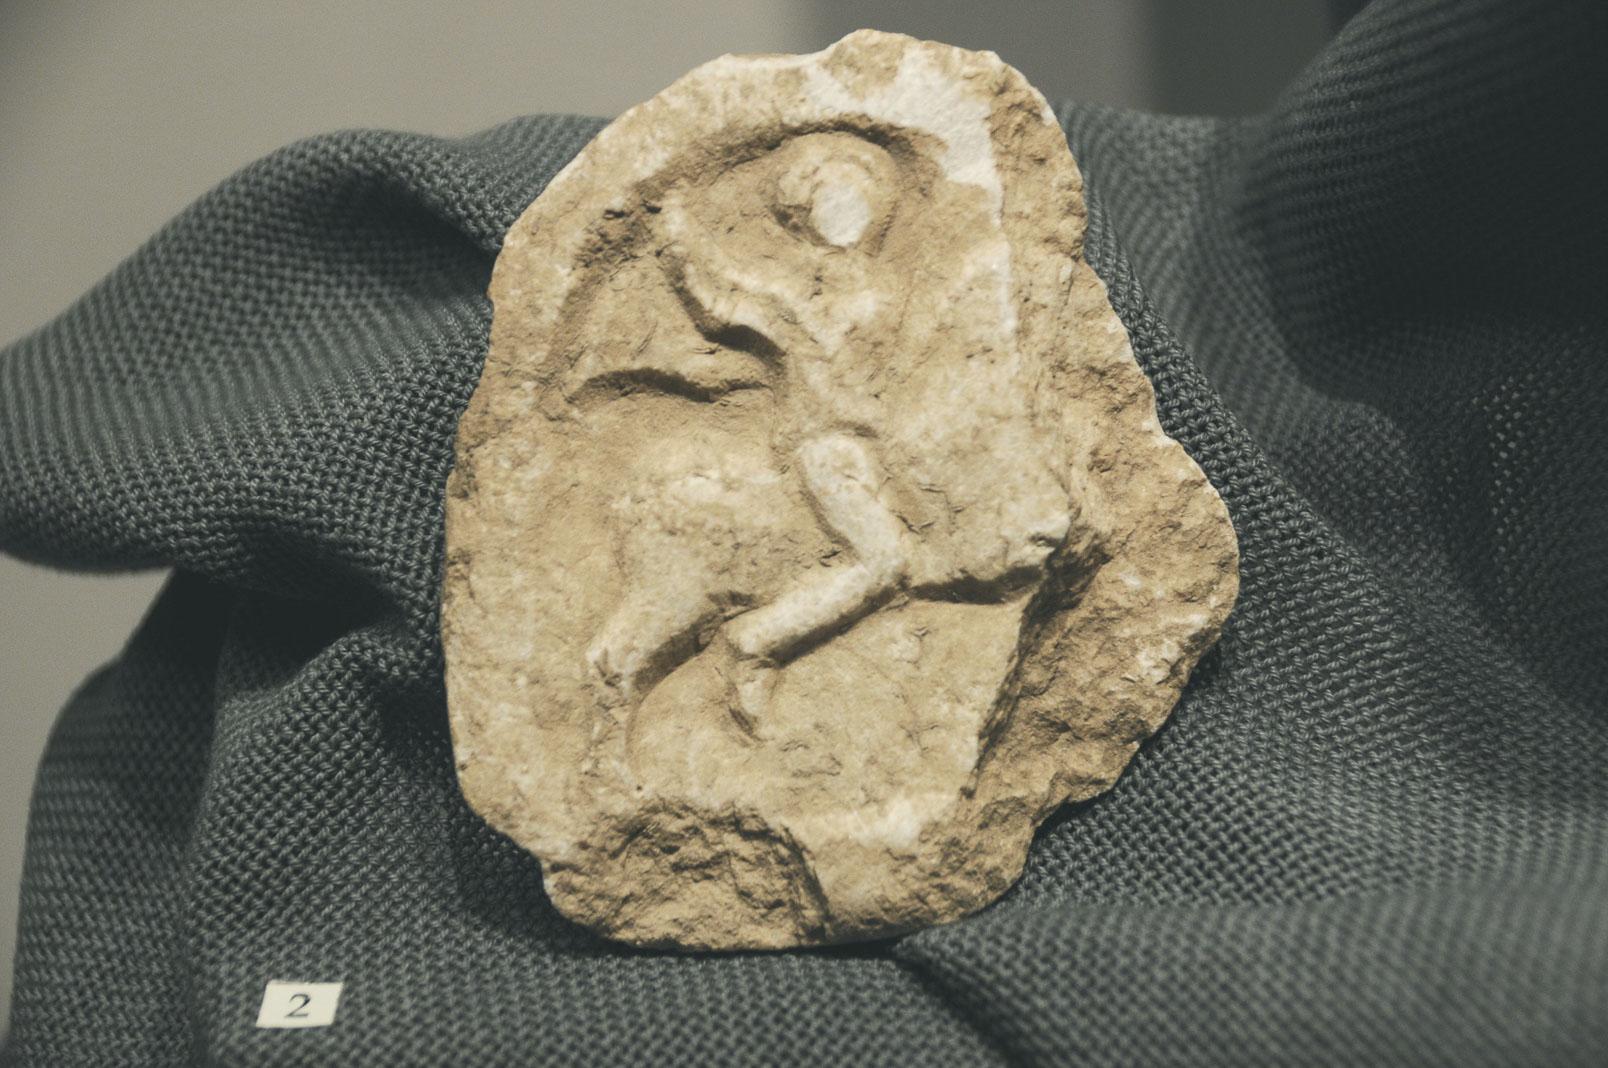 troyan-museum-jivotat-na-edna-idea-3